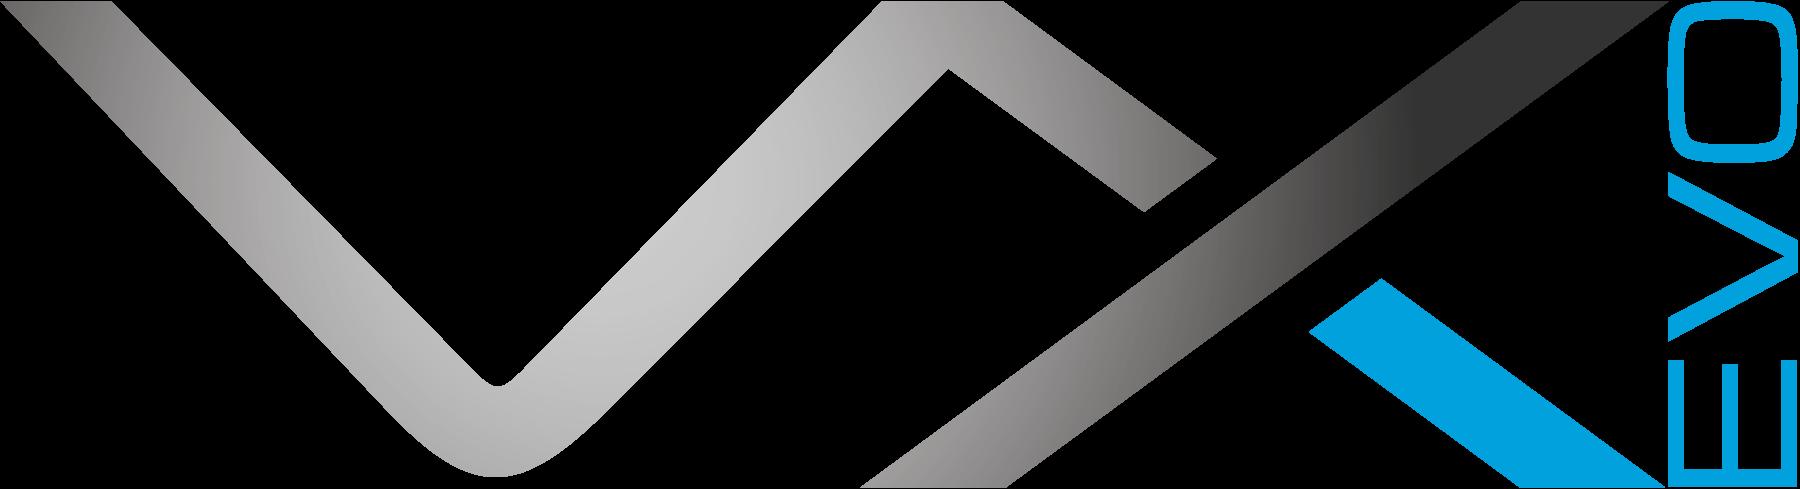 vxevo-logo.png